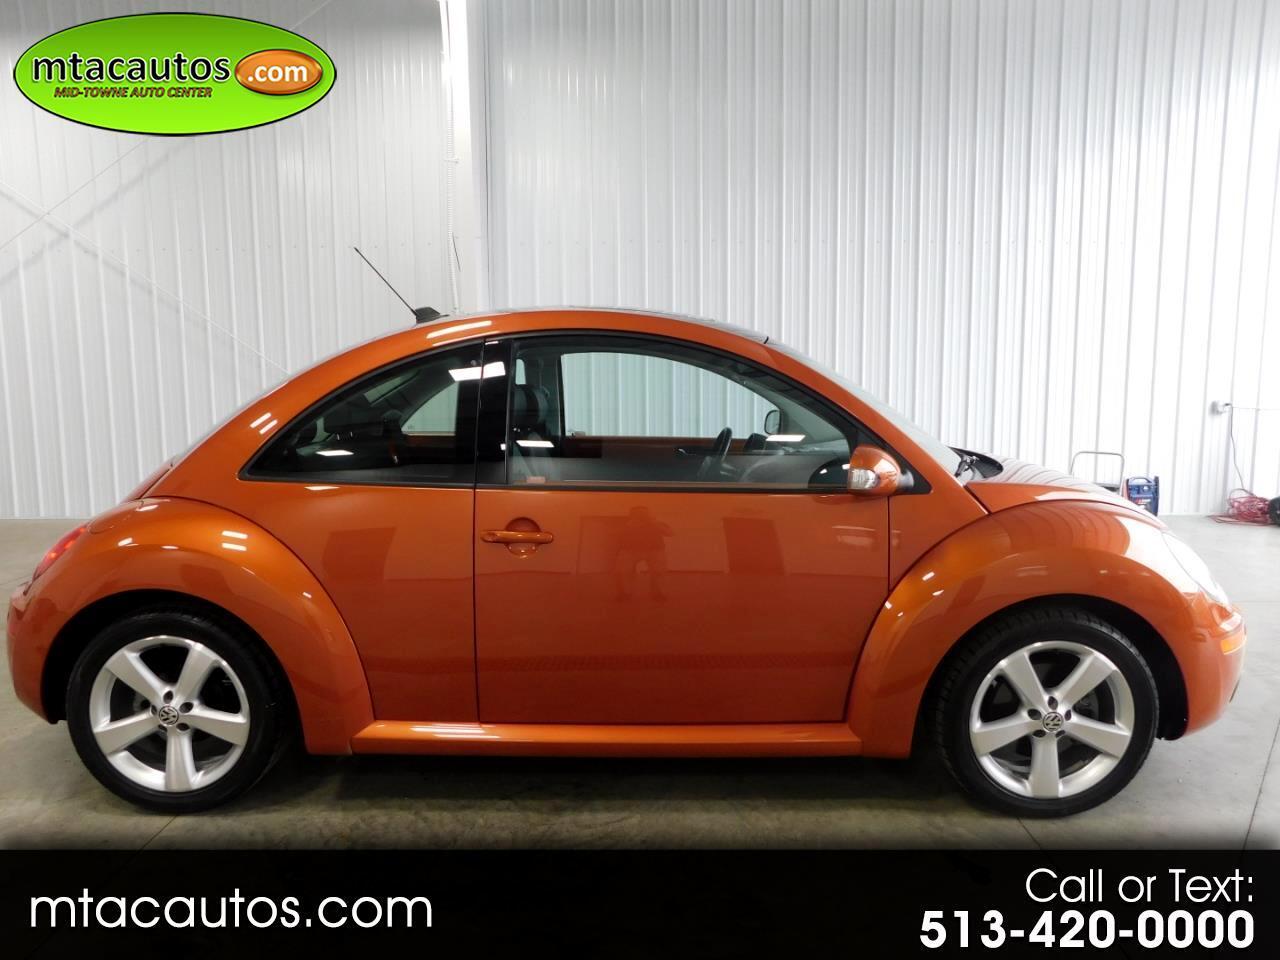 2010 Volkswagen New Beetle 2.5L RED ROCK EDITION